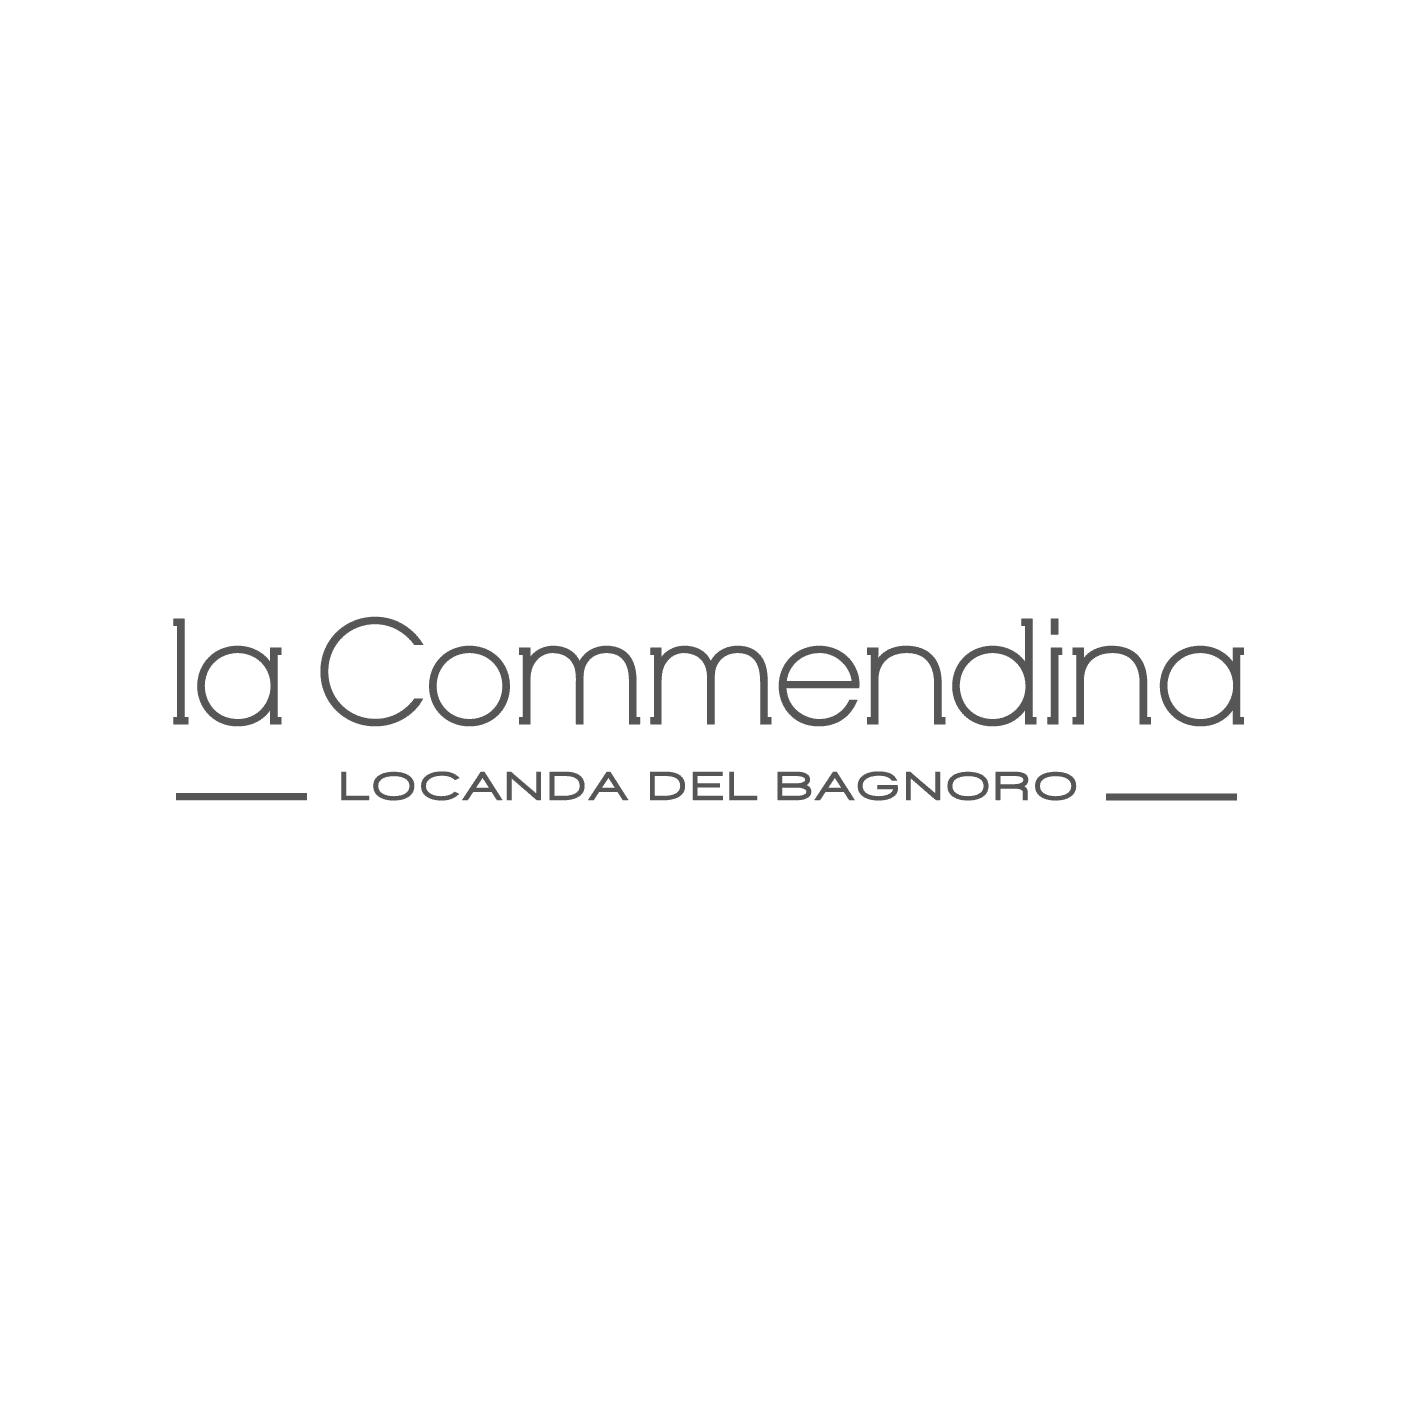 COMMENDINA